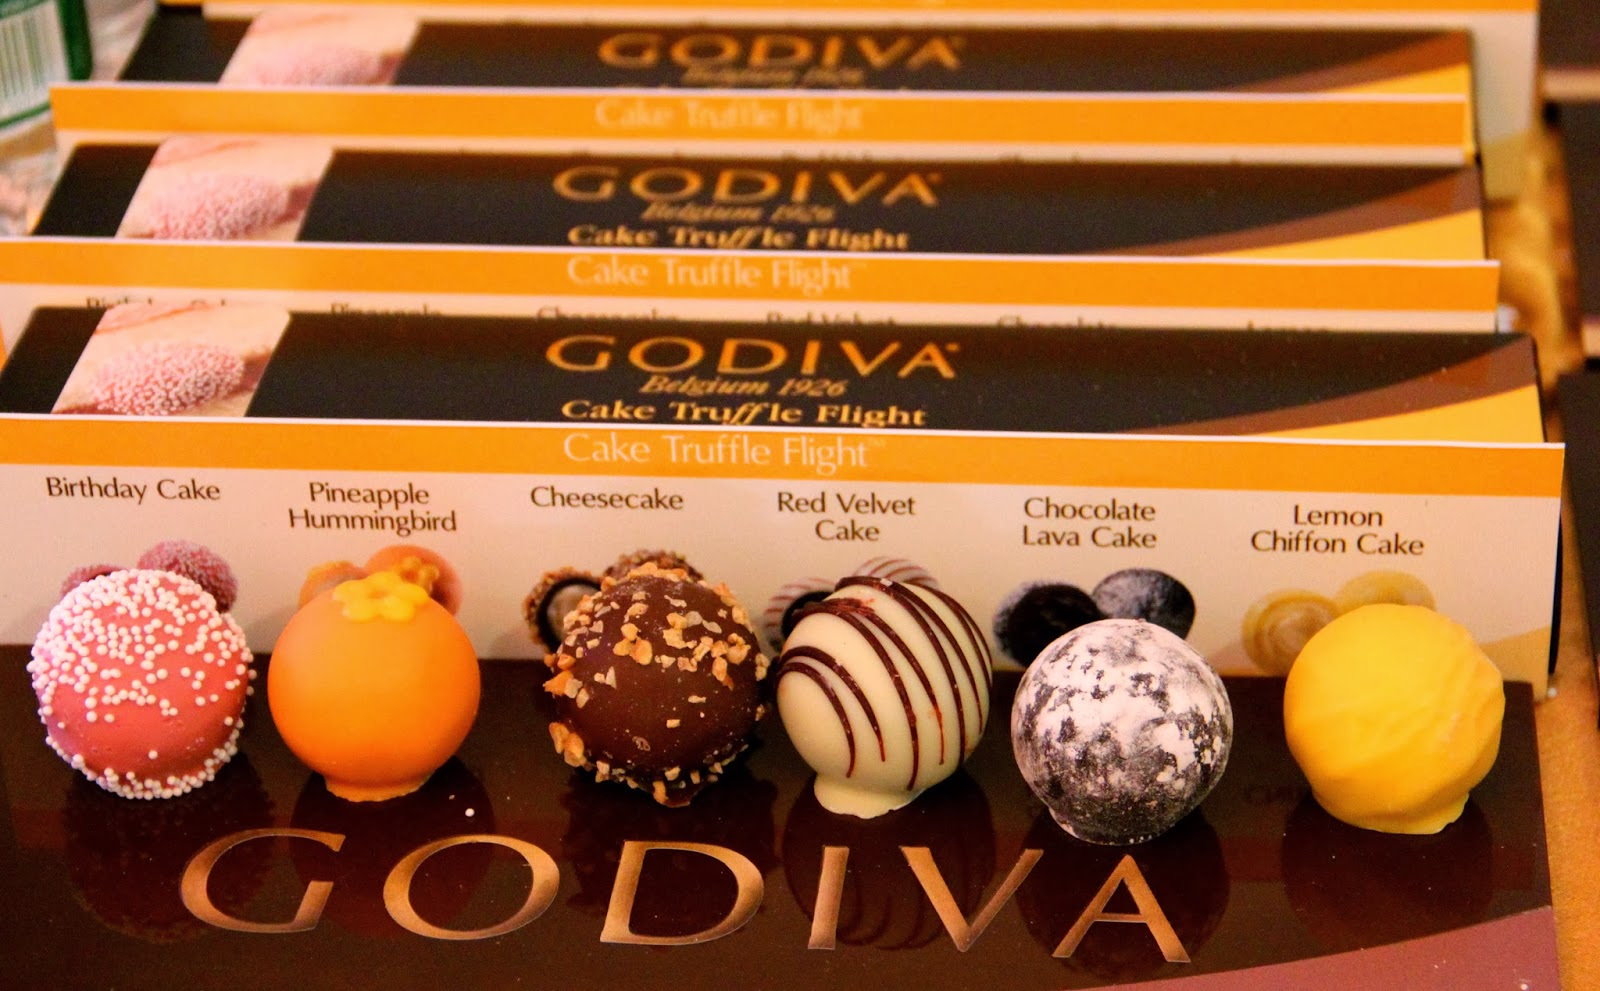 Fashionably Petite Godiva Truffle Flight Collection